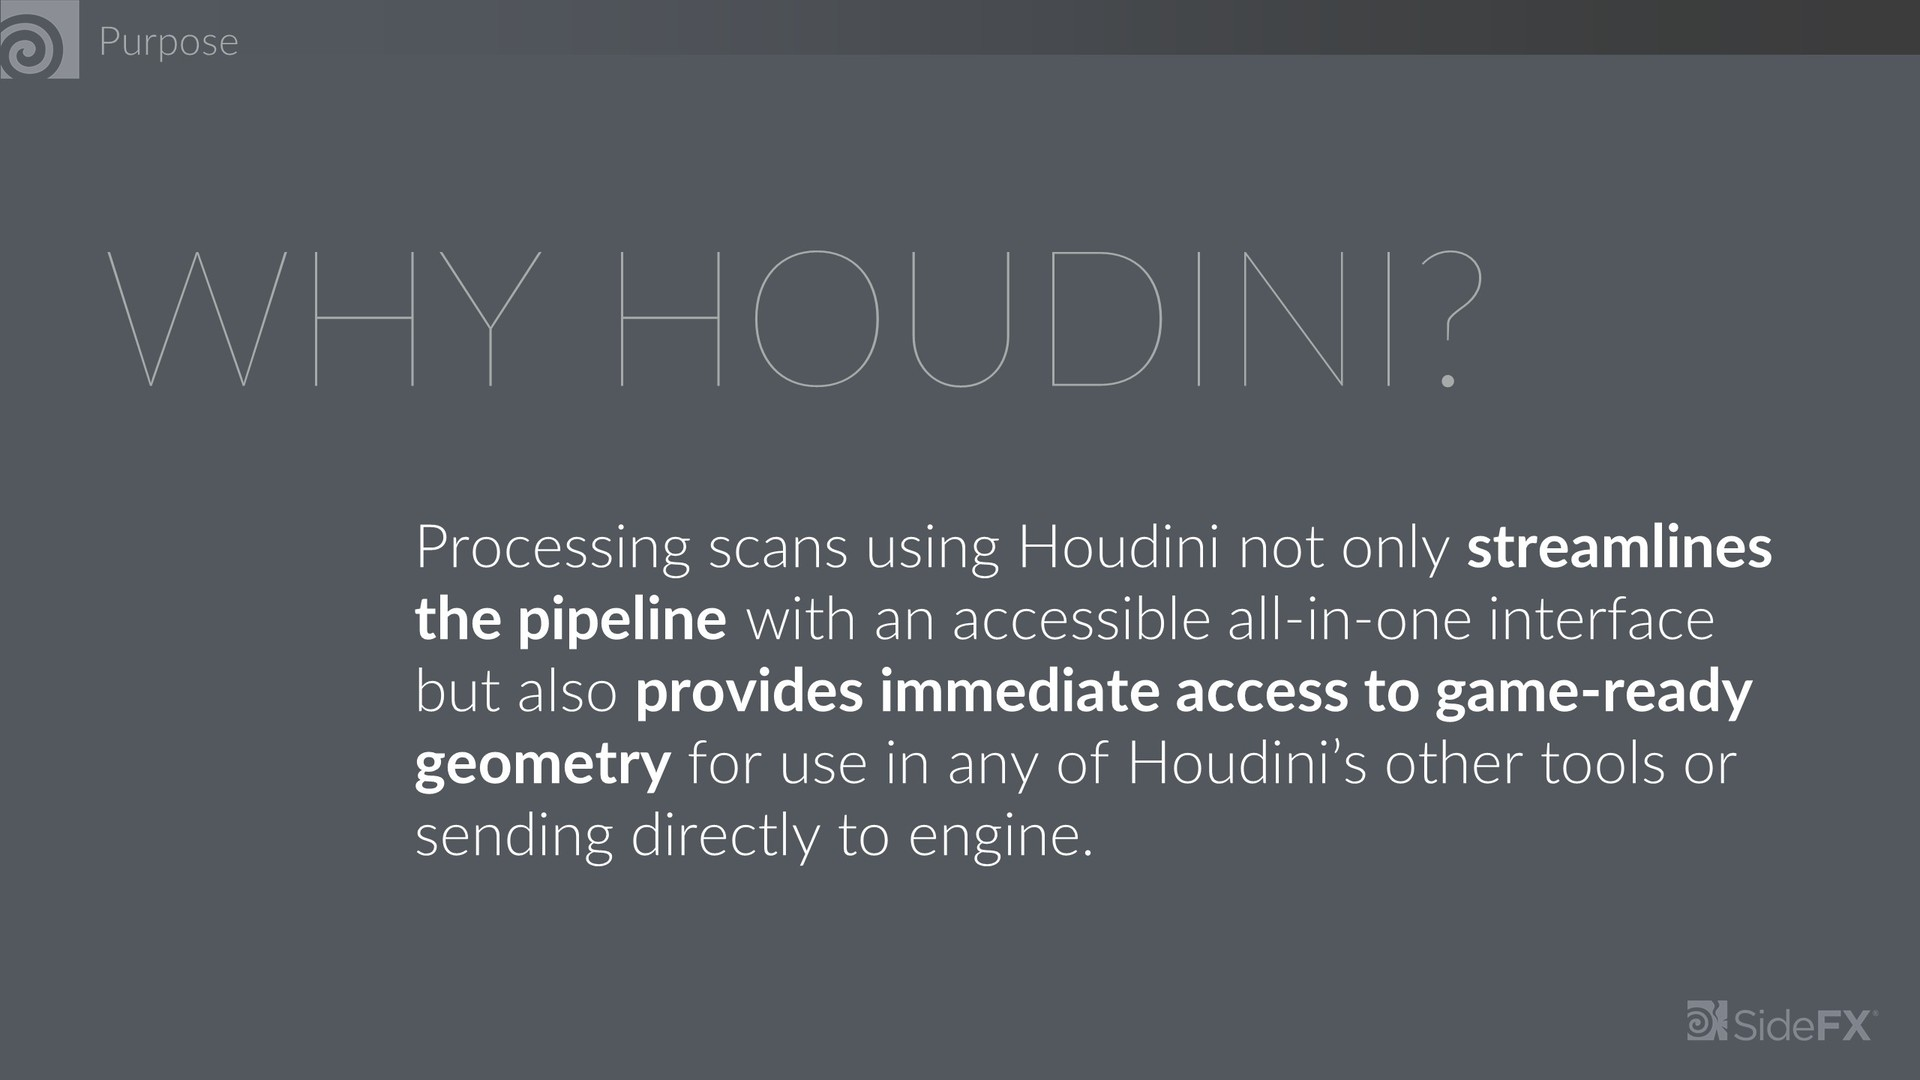 ArtStation - Houdini + RealityCapture (SideFX Internship), Georbec Ammon